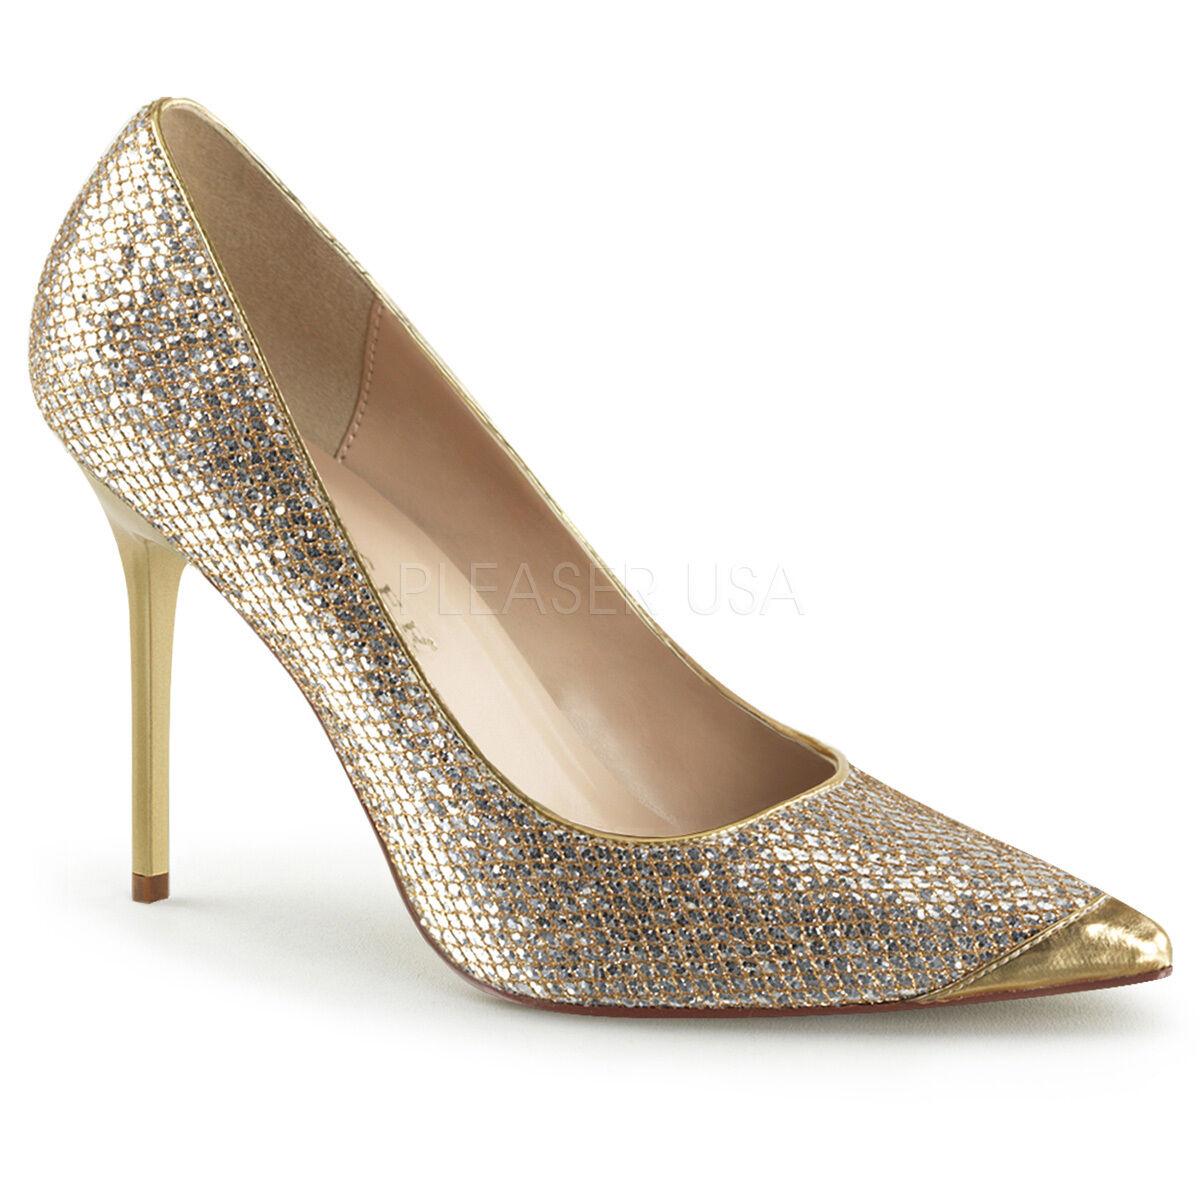 PLEASER CLASSIQUE-20 GOLD GOLD CLASSIQUE-20 GLITTER CLASSIC LADIES DRAG QUEEN COURT Schuhe 4e9a34